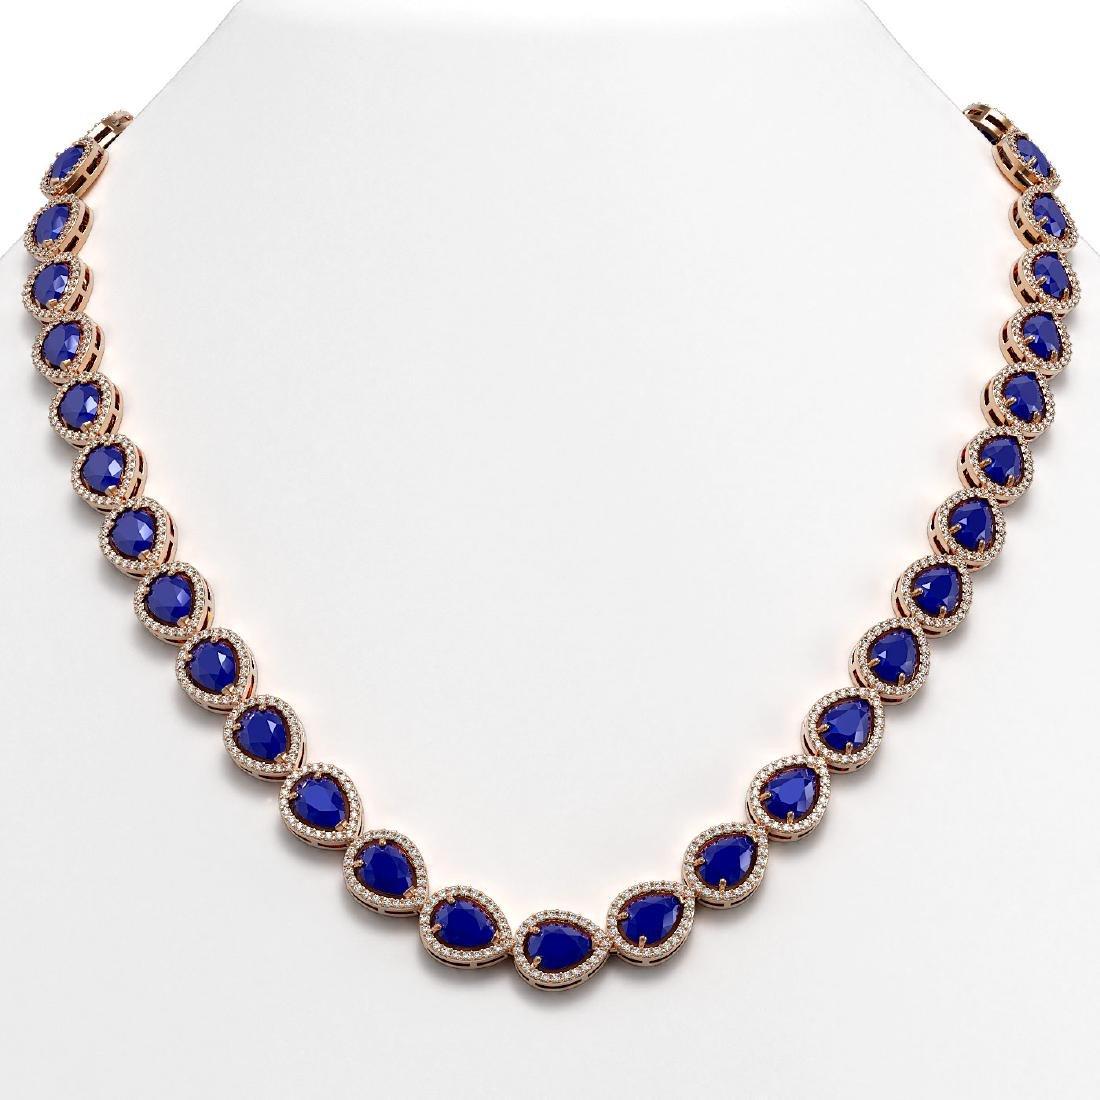 45.93 CTW Sapphire & Diamond Halo Necklace 10K Rose